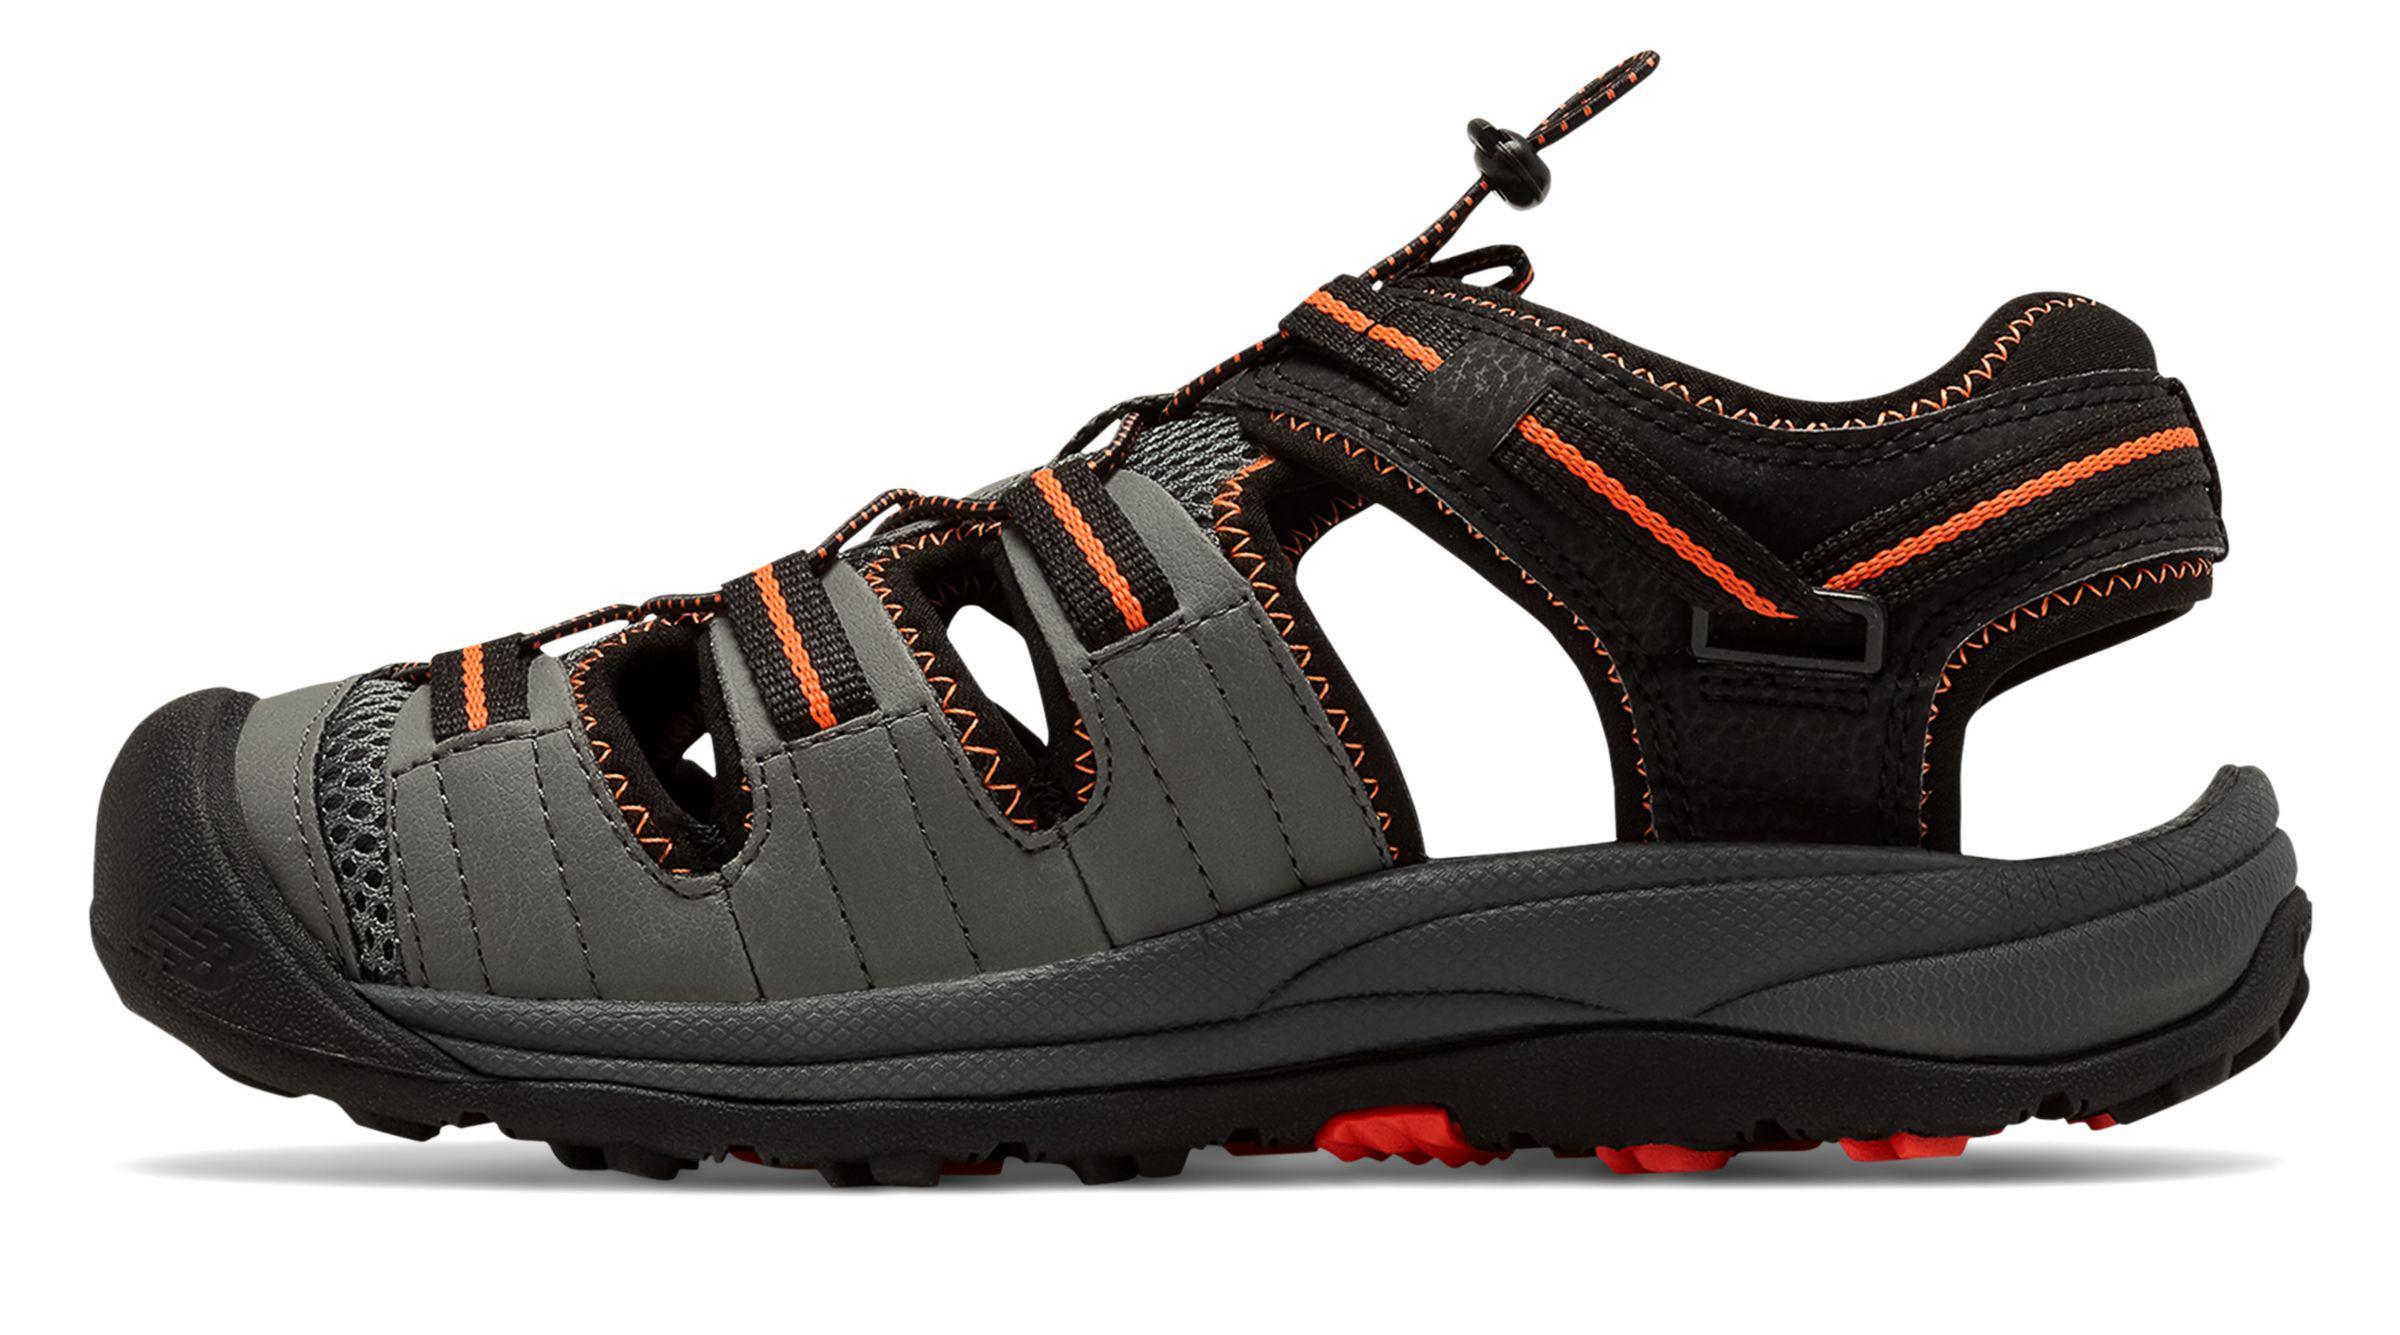 b225ce11f5ea1 New Balance - Black Appalachian Sandal for Men - Lyst. View fullscreen